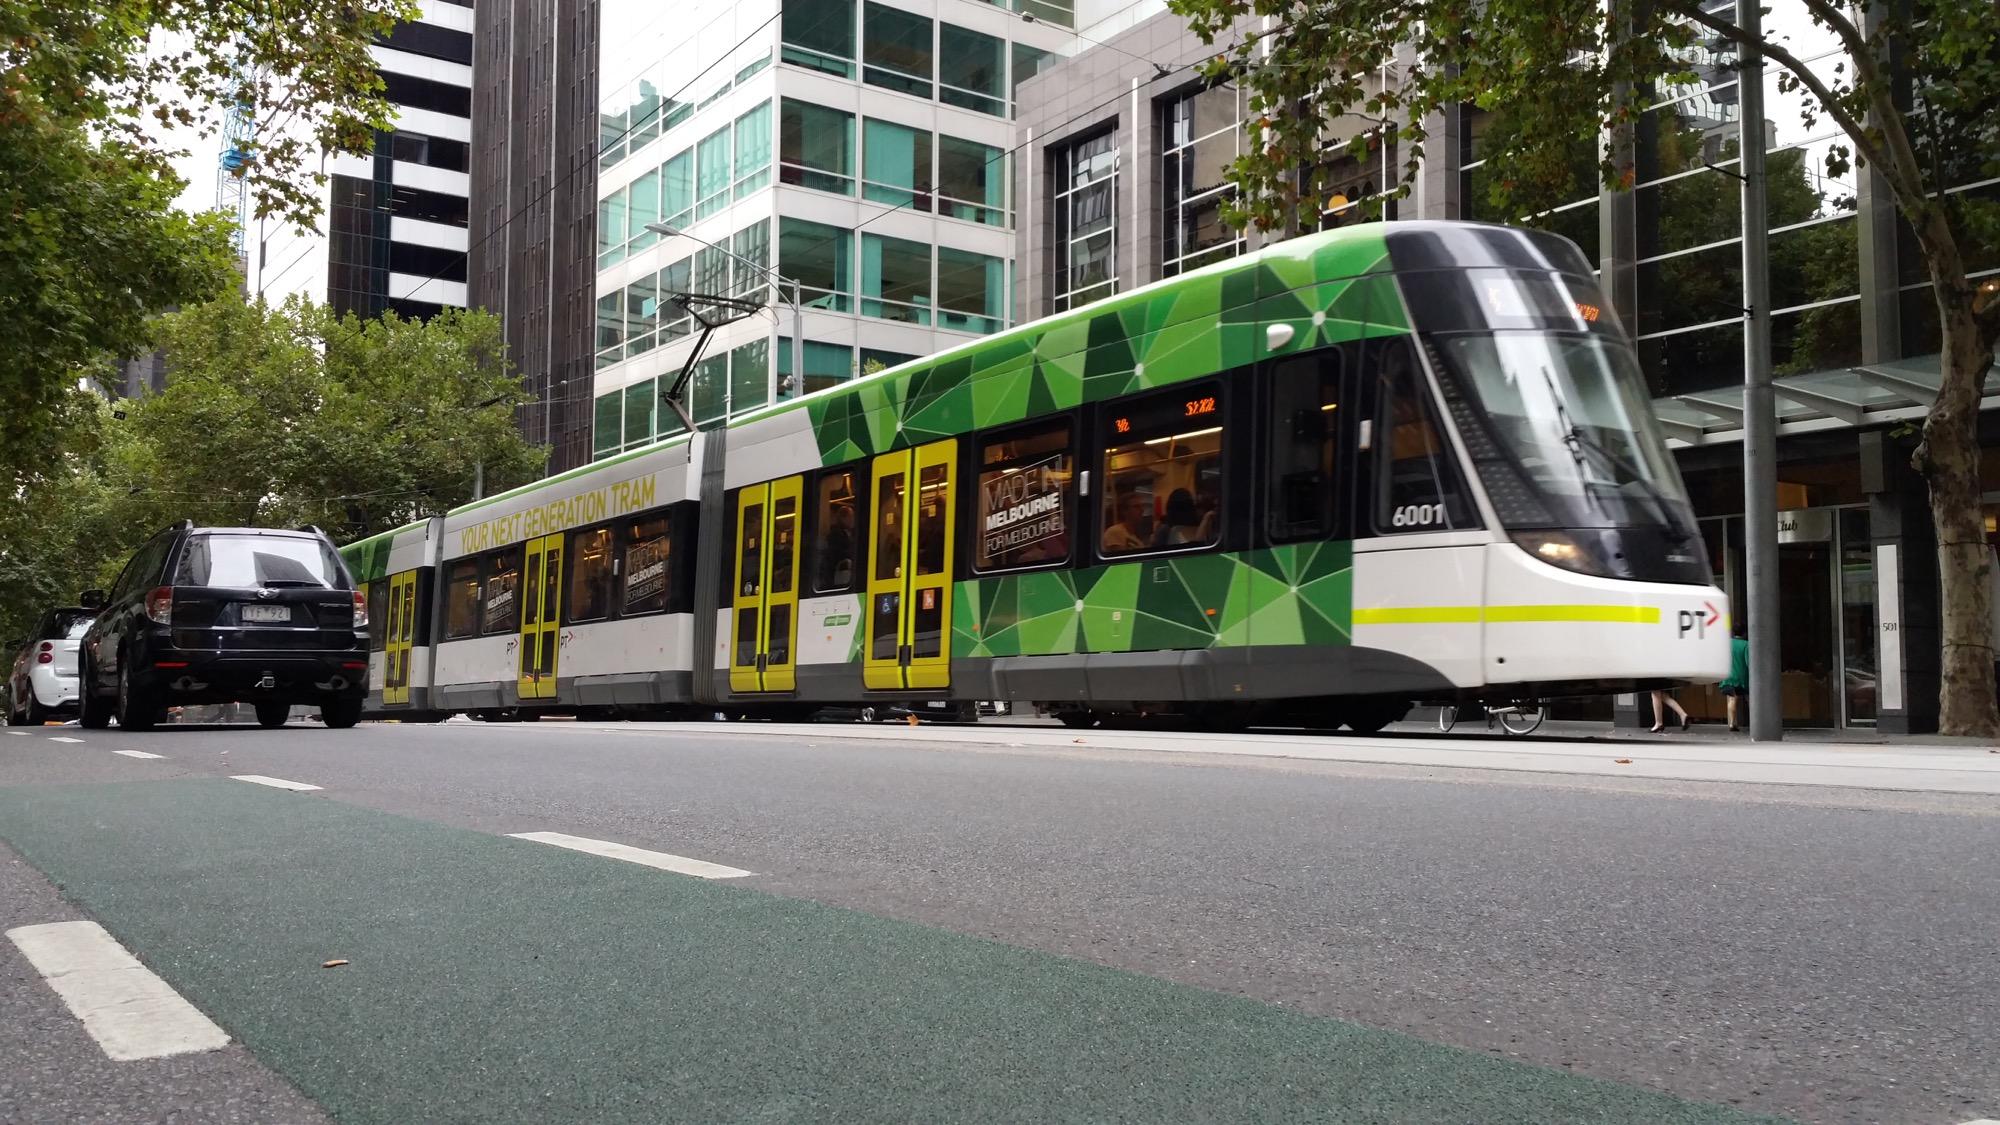 Melbourne stuff - 1 of 223 (211).jpg